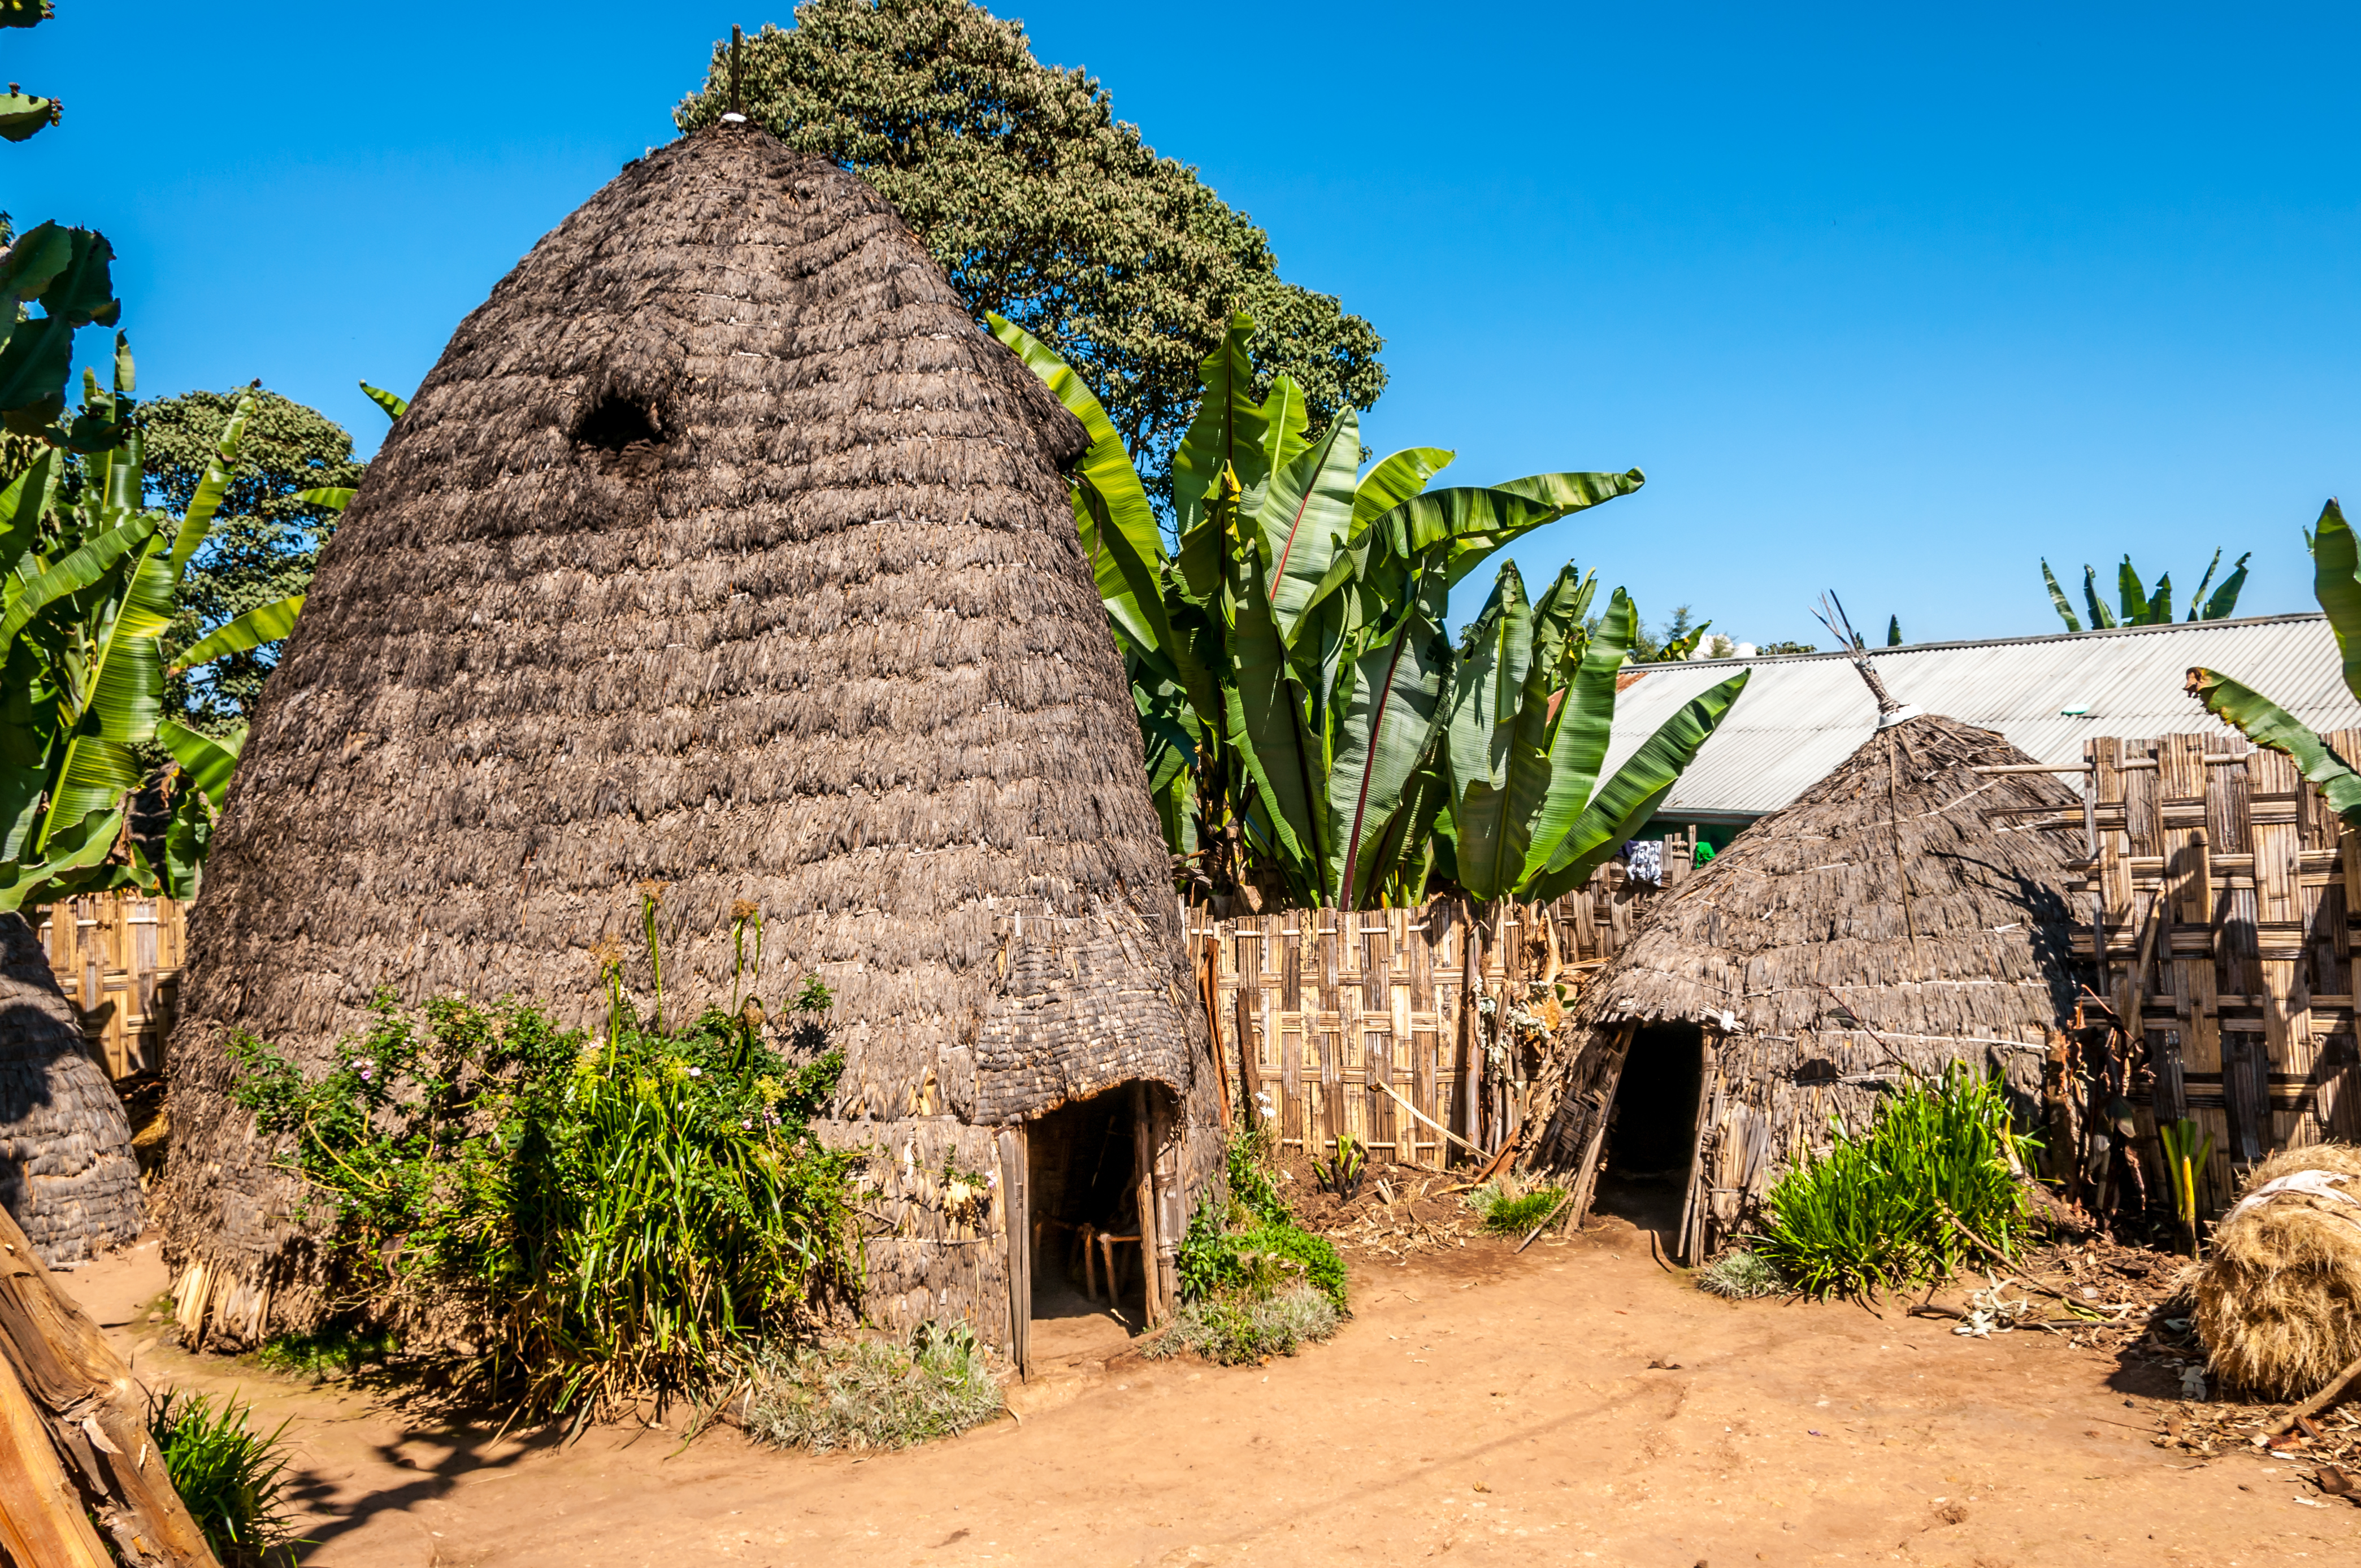 Dorza hut